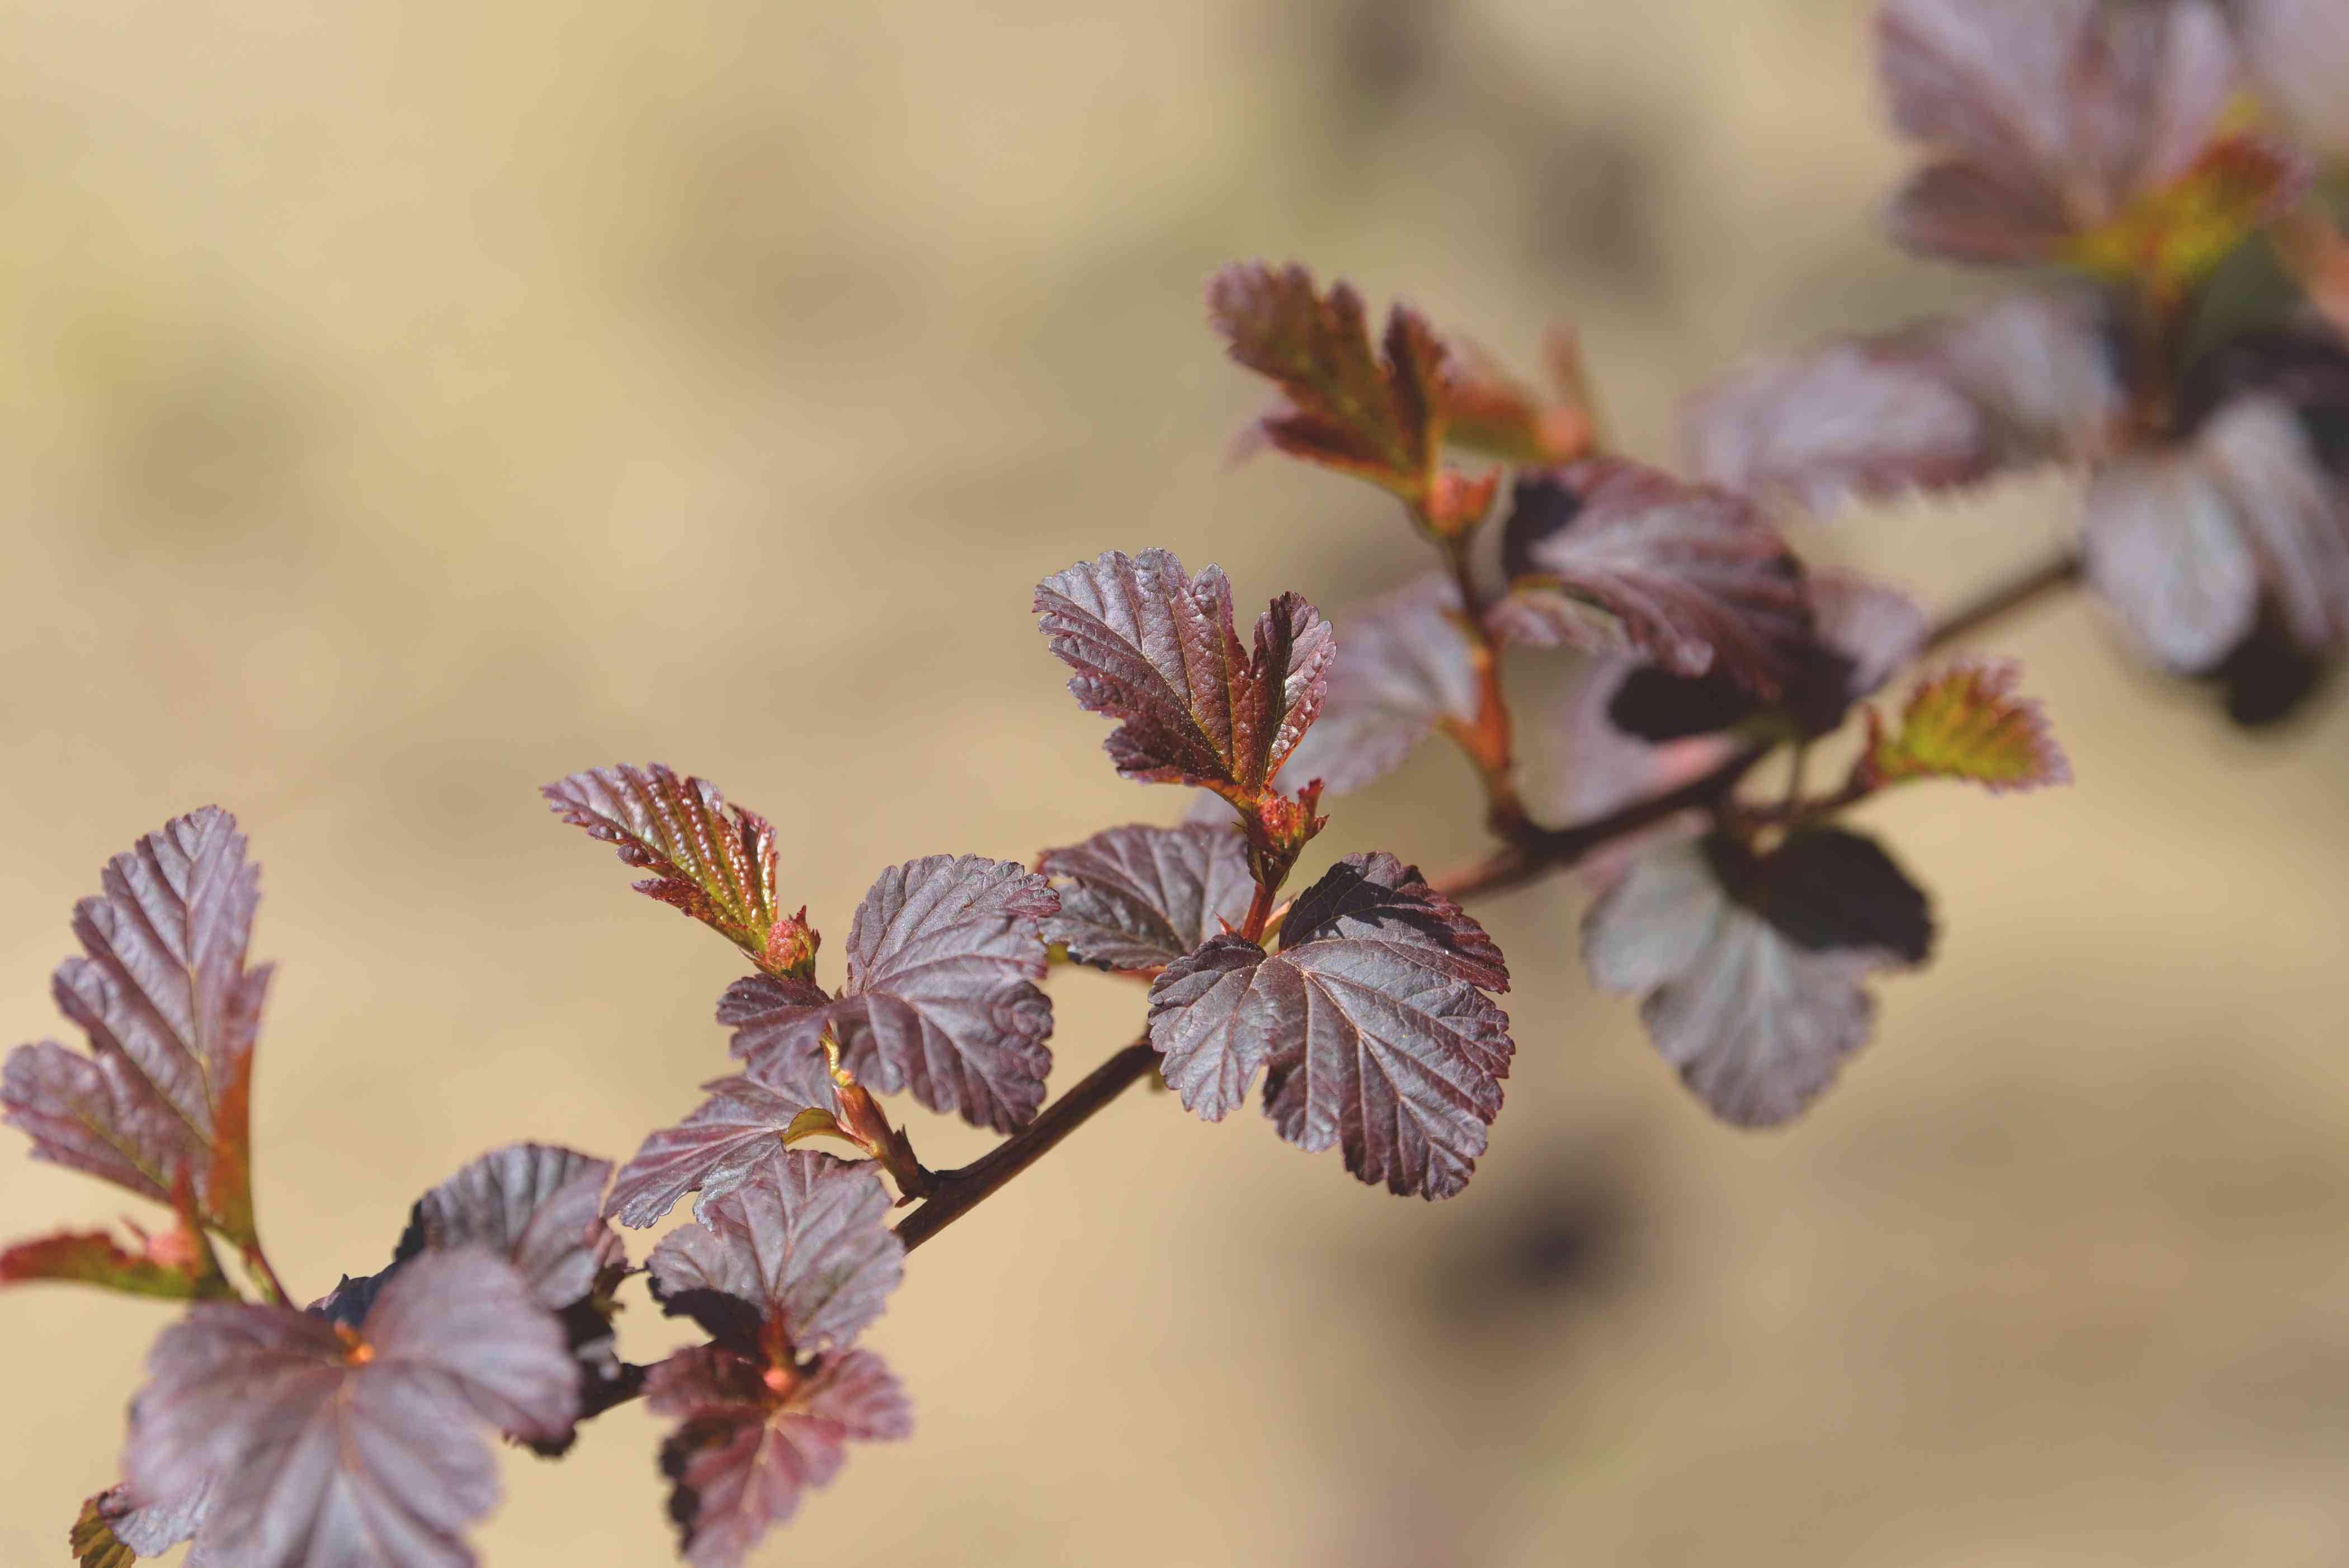 Diablo ninebark branch with reddish and purplish leaves in sunlight closeup